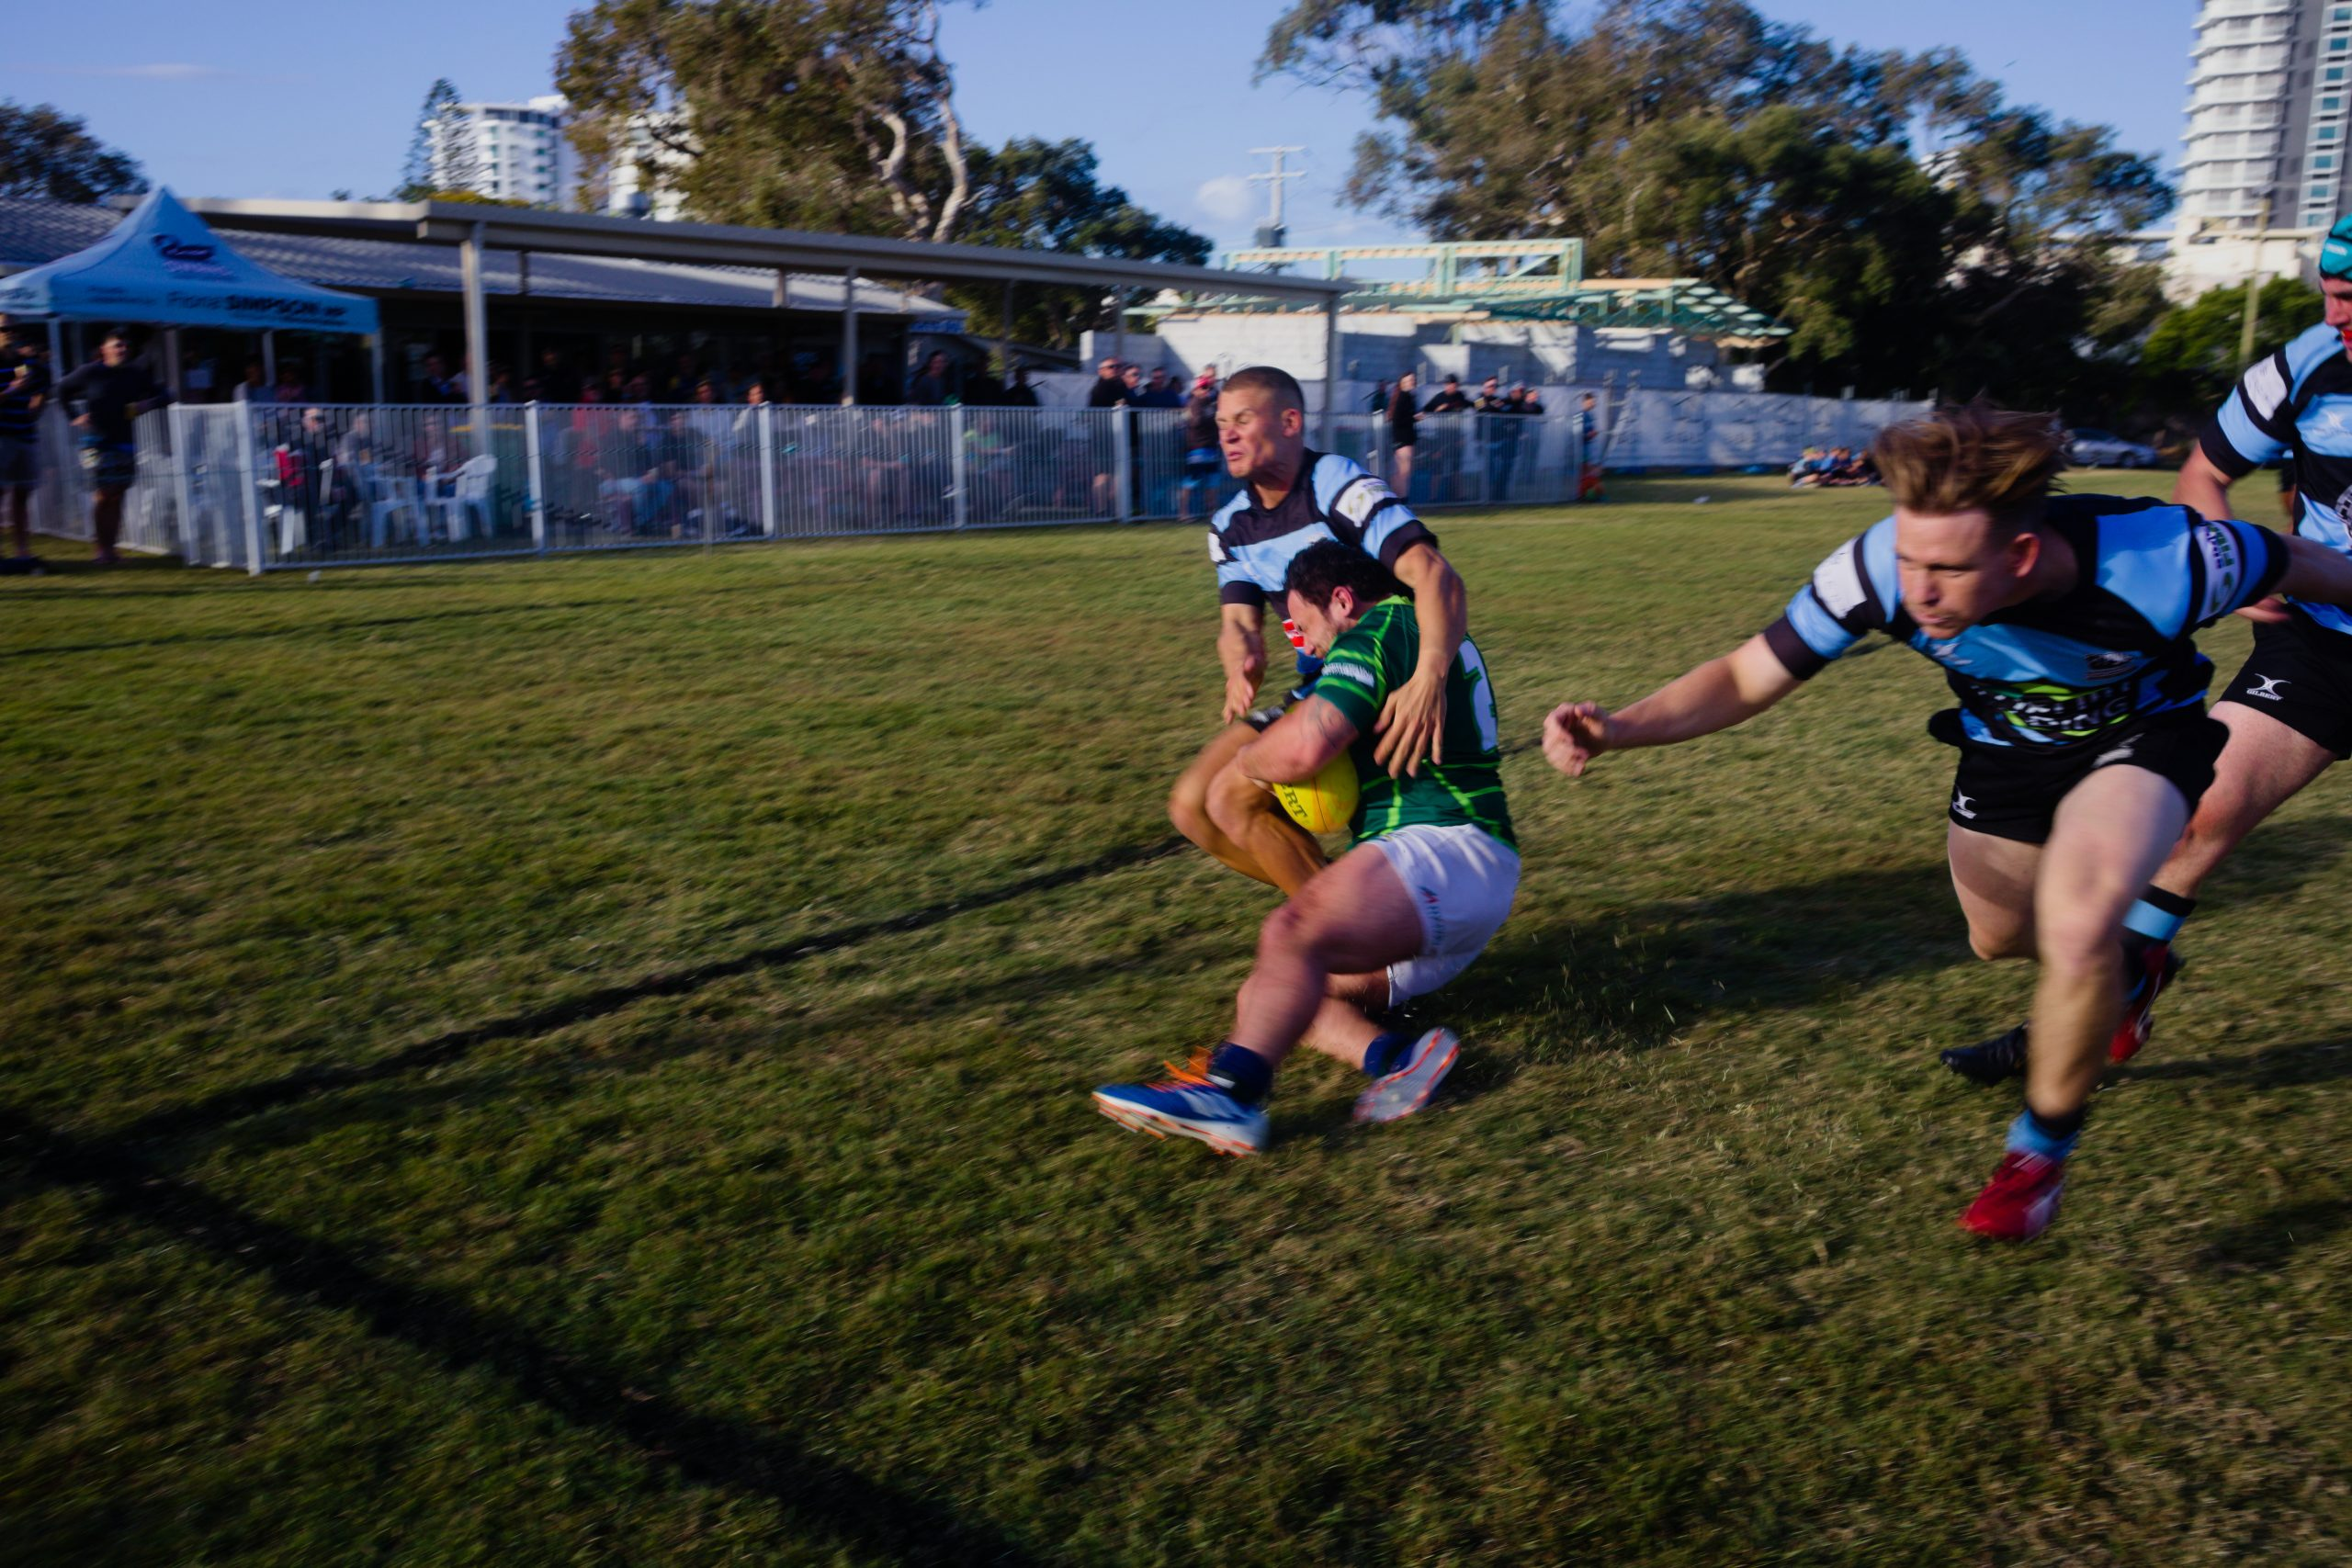 University defeat Maroochydore in round five of 2020 Sunshine Coast Rugby Union season